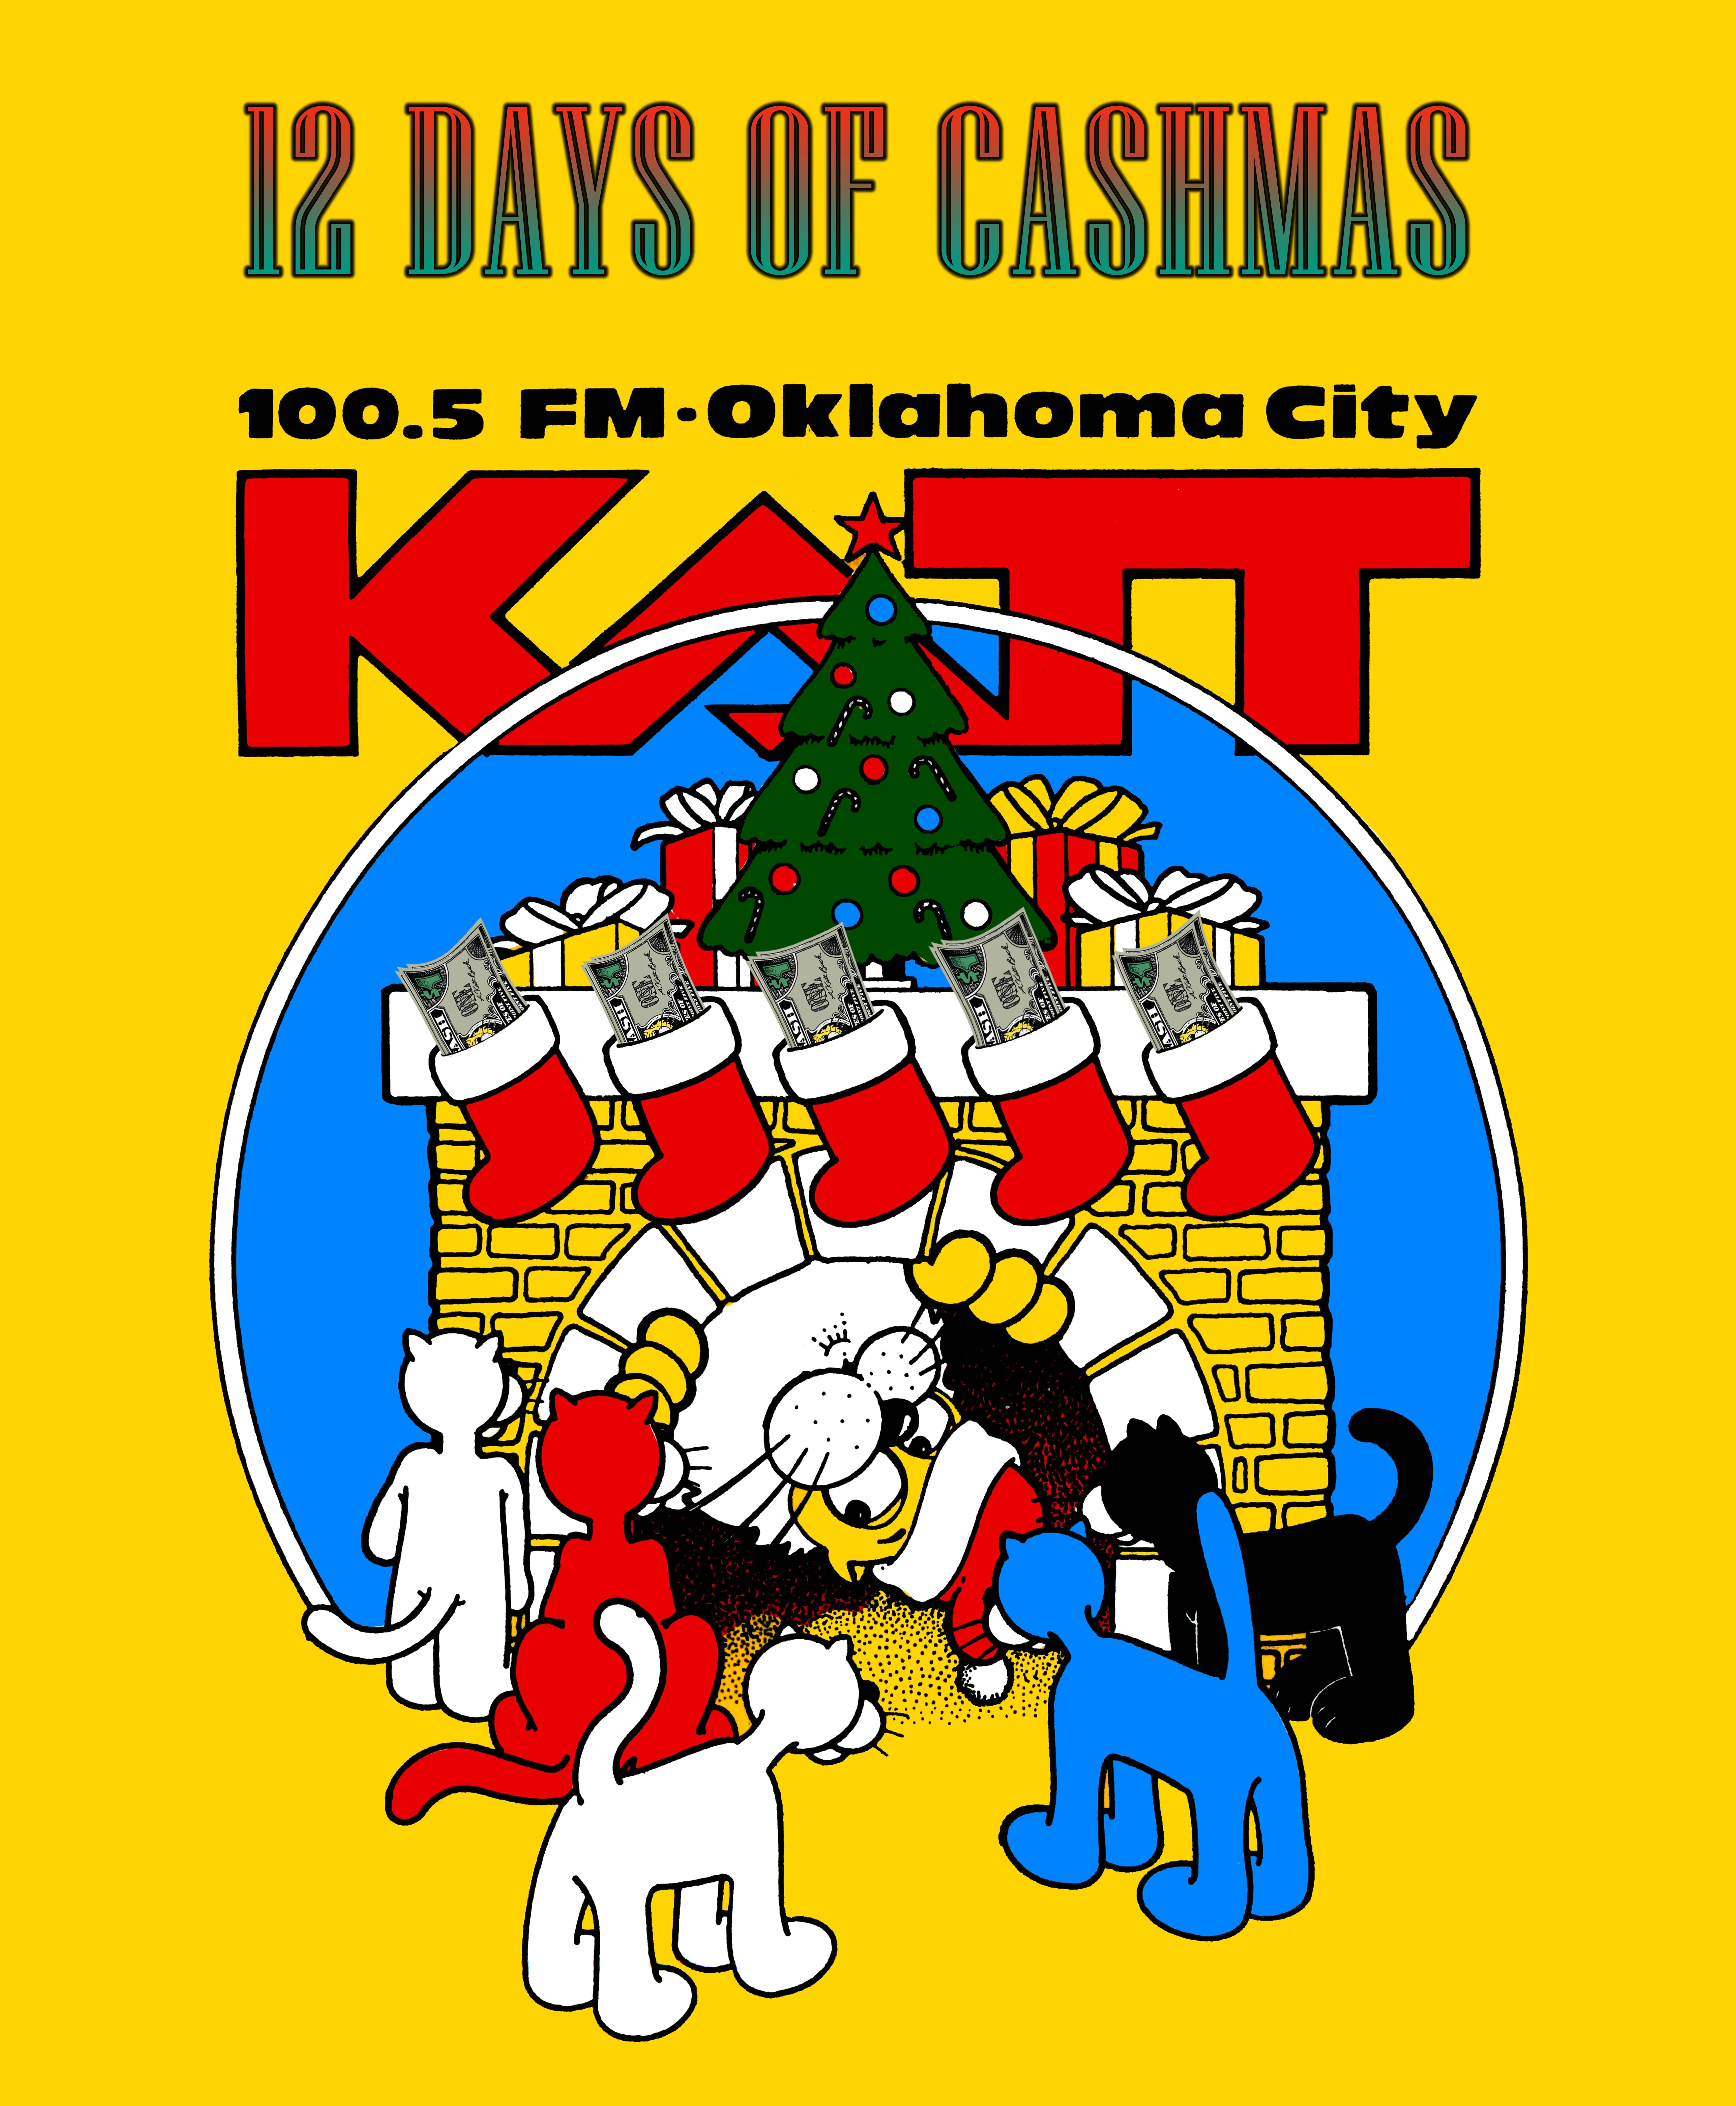 KATT's 12 Days of Cashmas